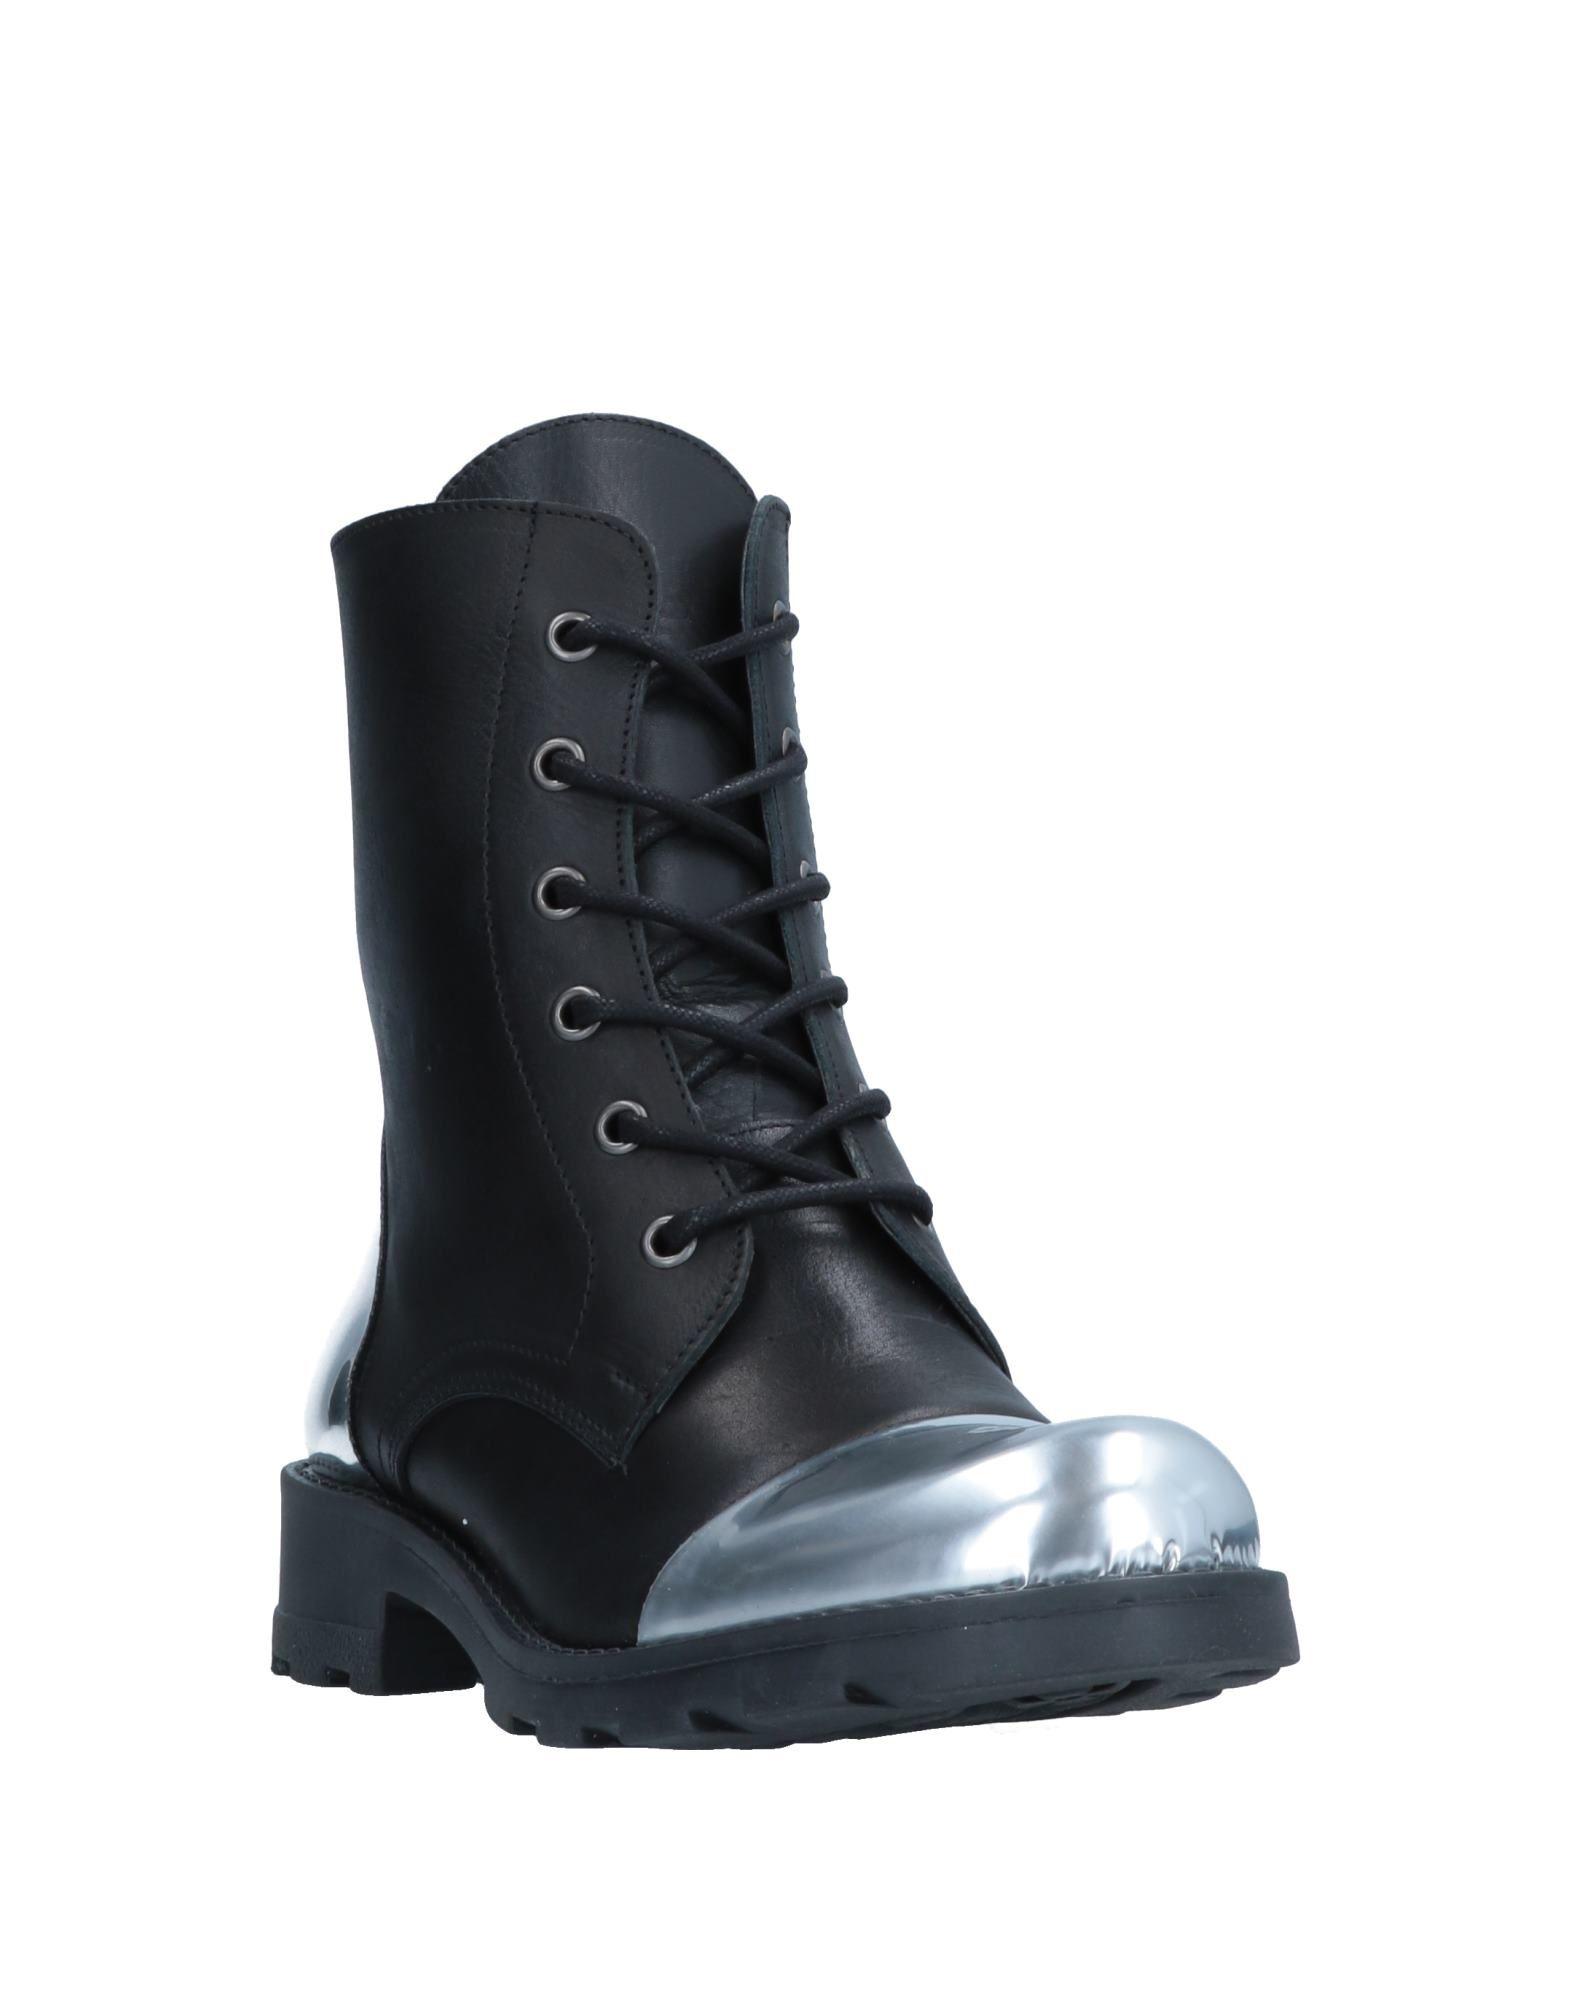 Unlace Stiefelette Damen  beliebte 11537686LL Gute Qualität beliebte  Schuhe 97330e